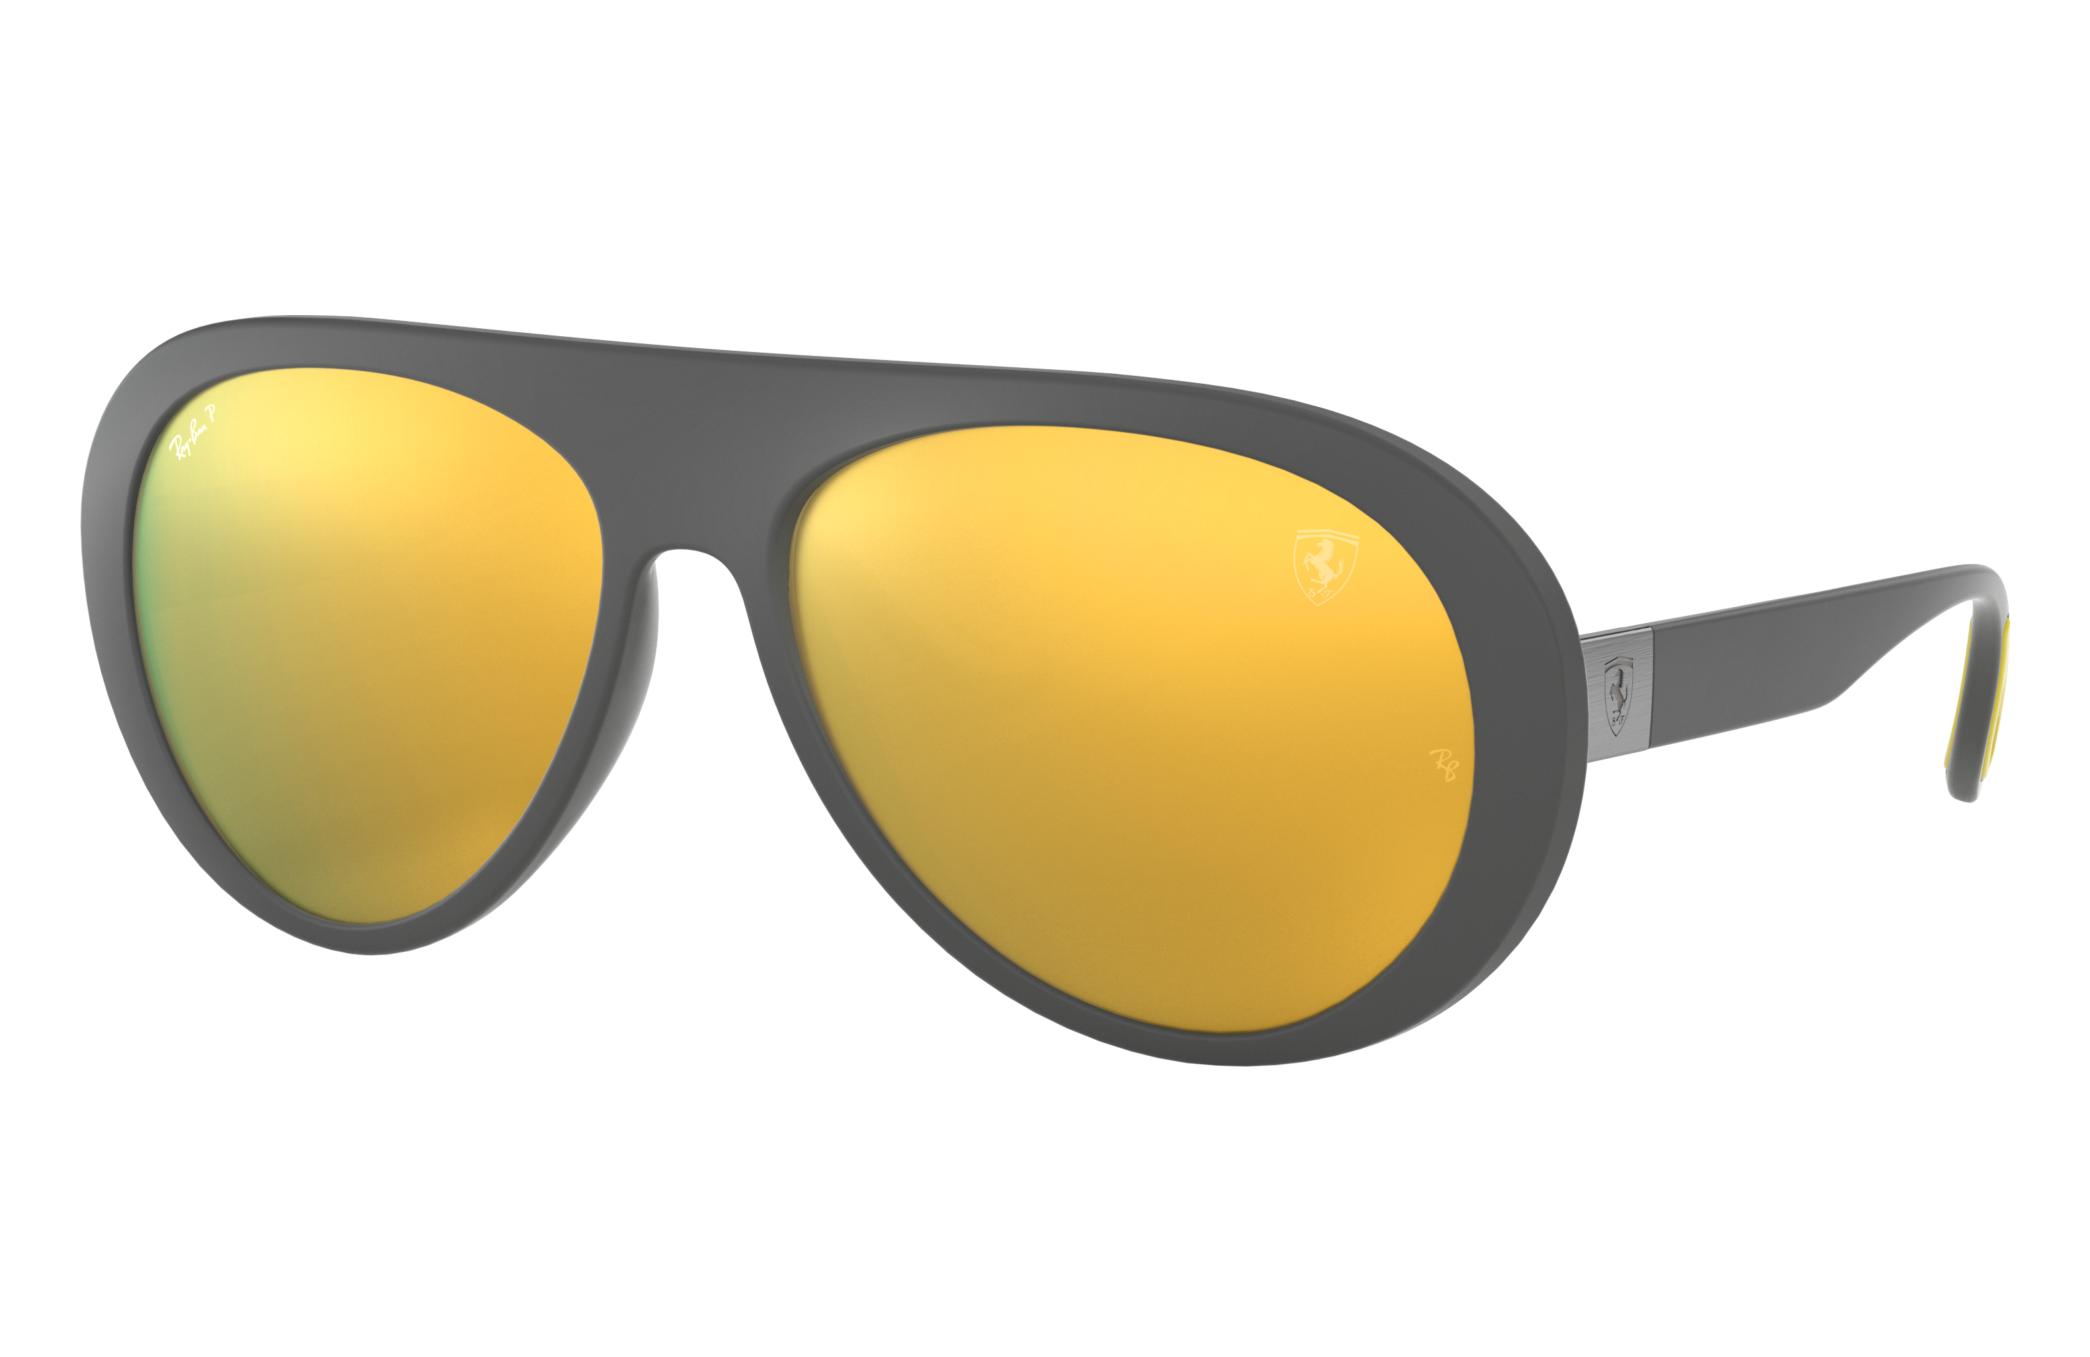 Ray-Ban Scuderia Ferrari Collection Rb4310m Grey, Polarized Yellow Lenses - RB4310M